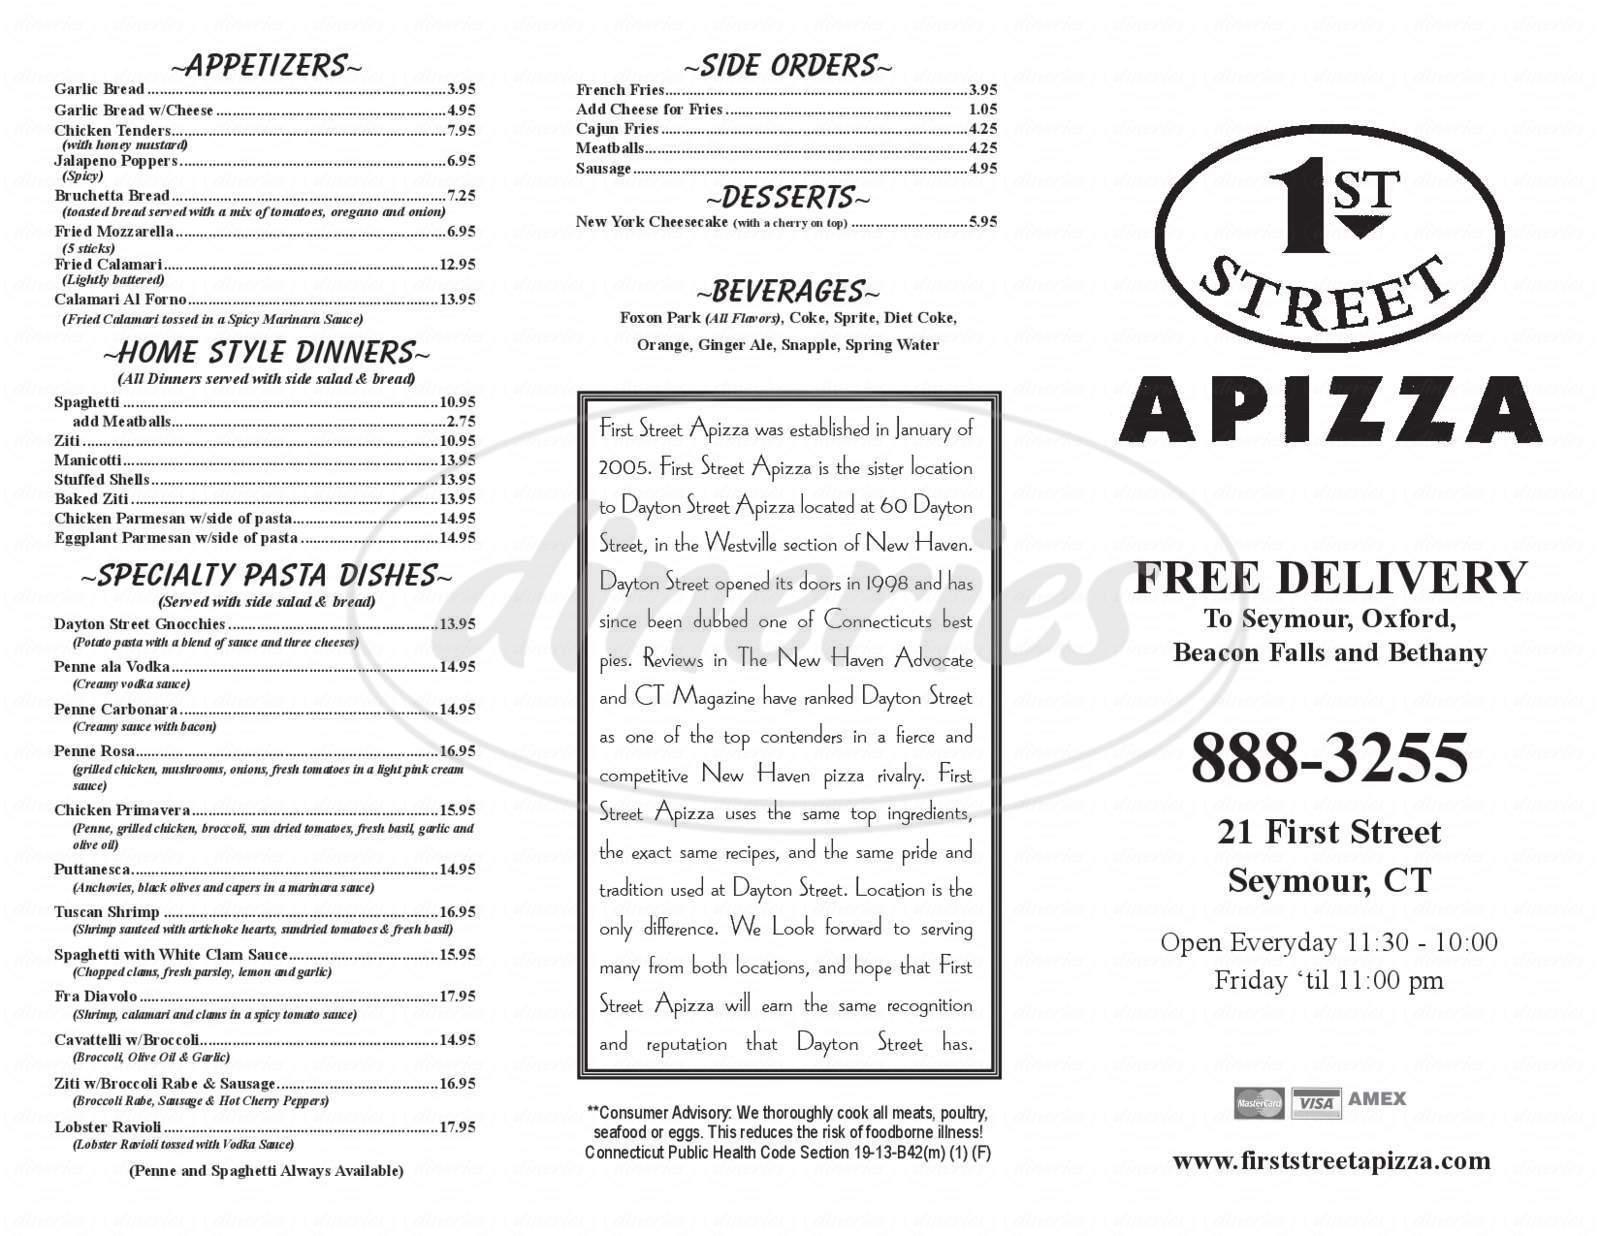 Big menu for First Street Apizza, Seymour